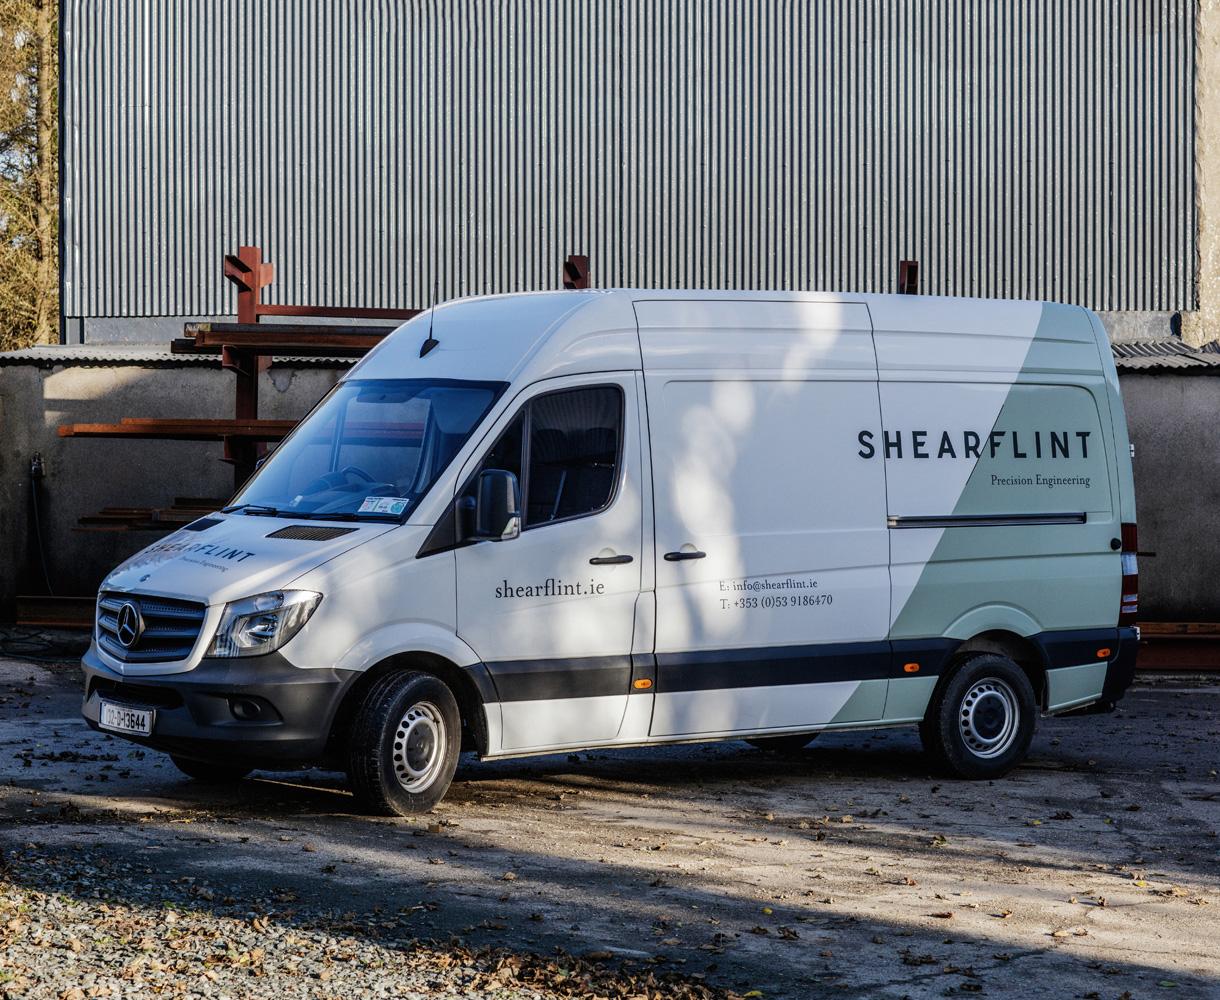 Principle brand agency Dublin Shearflint brand project van livery design